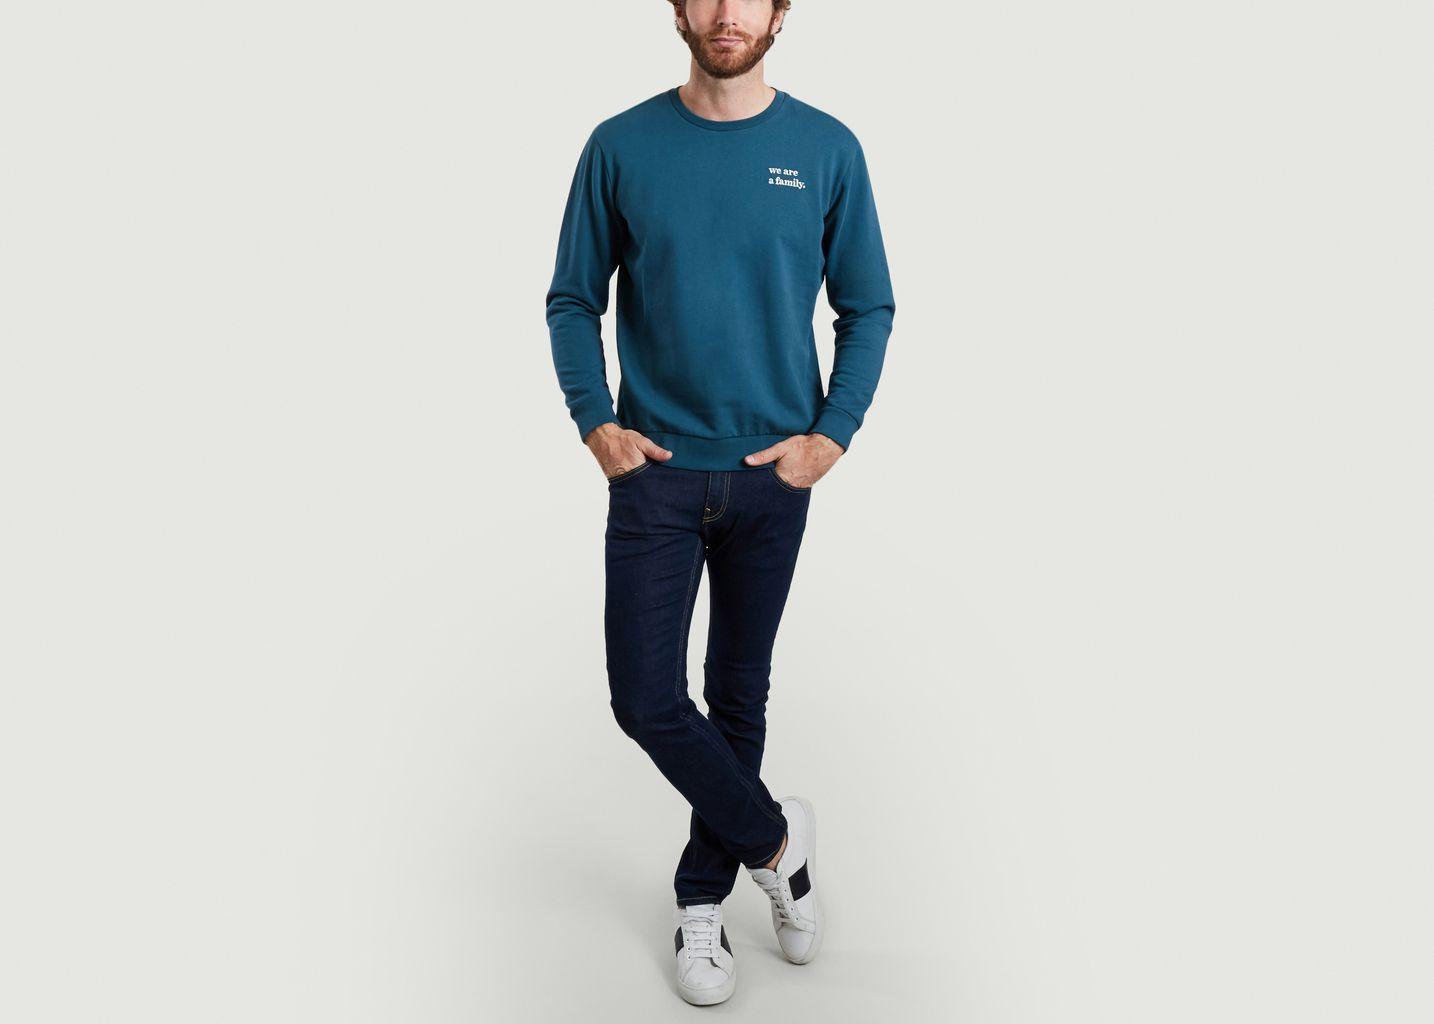 Sweatshirt brodé Karim - Cuisse de Grenouille